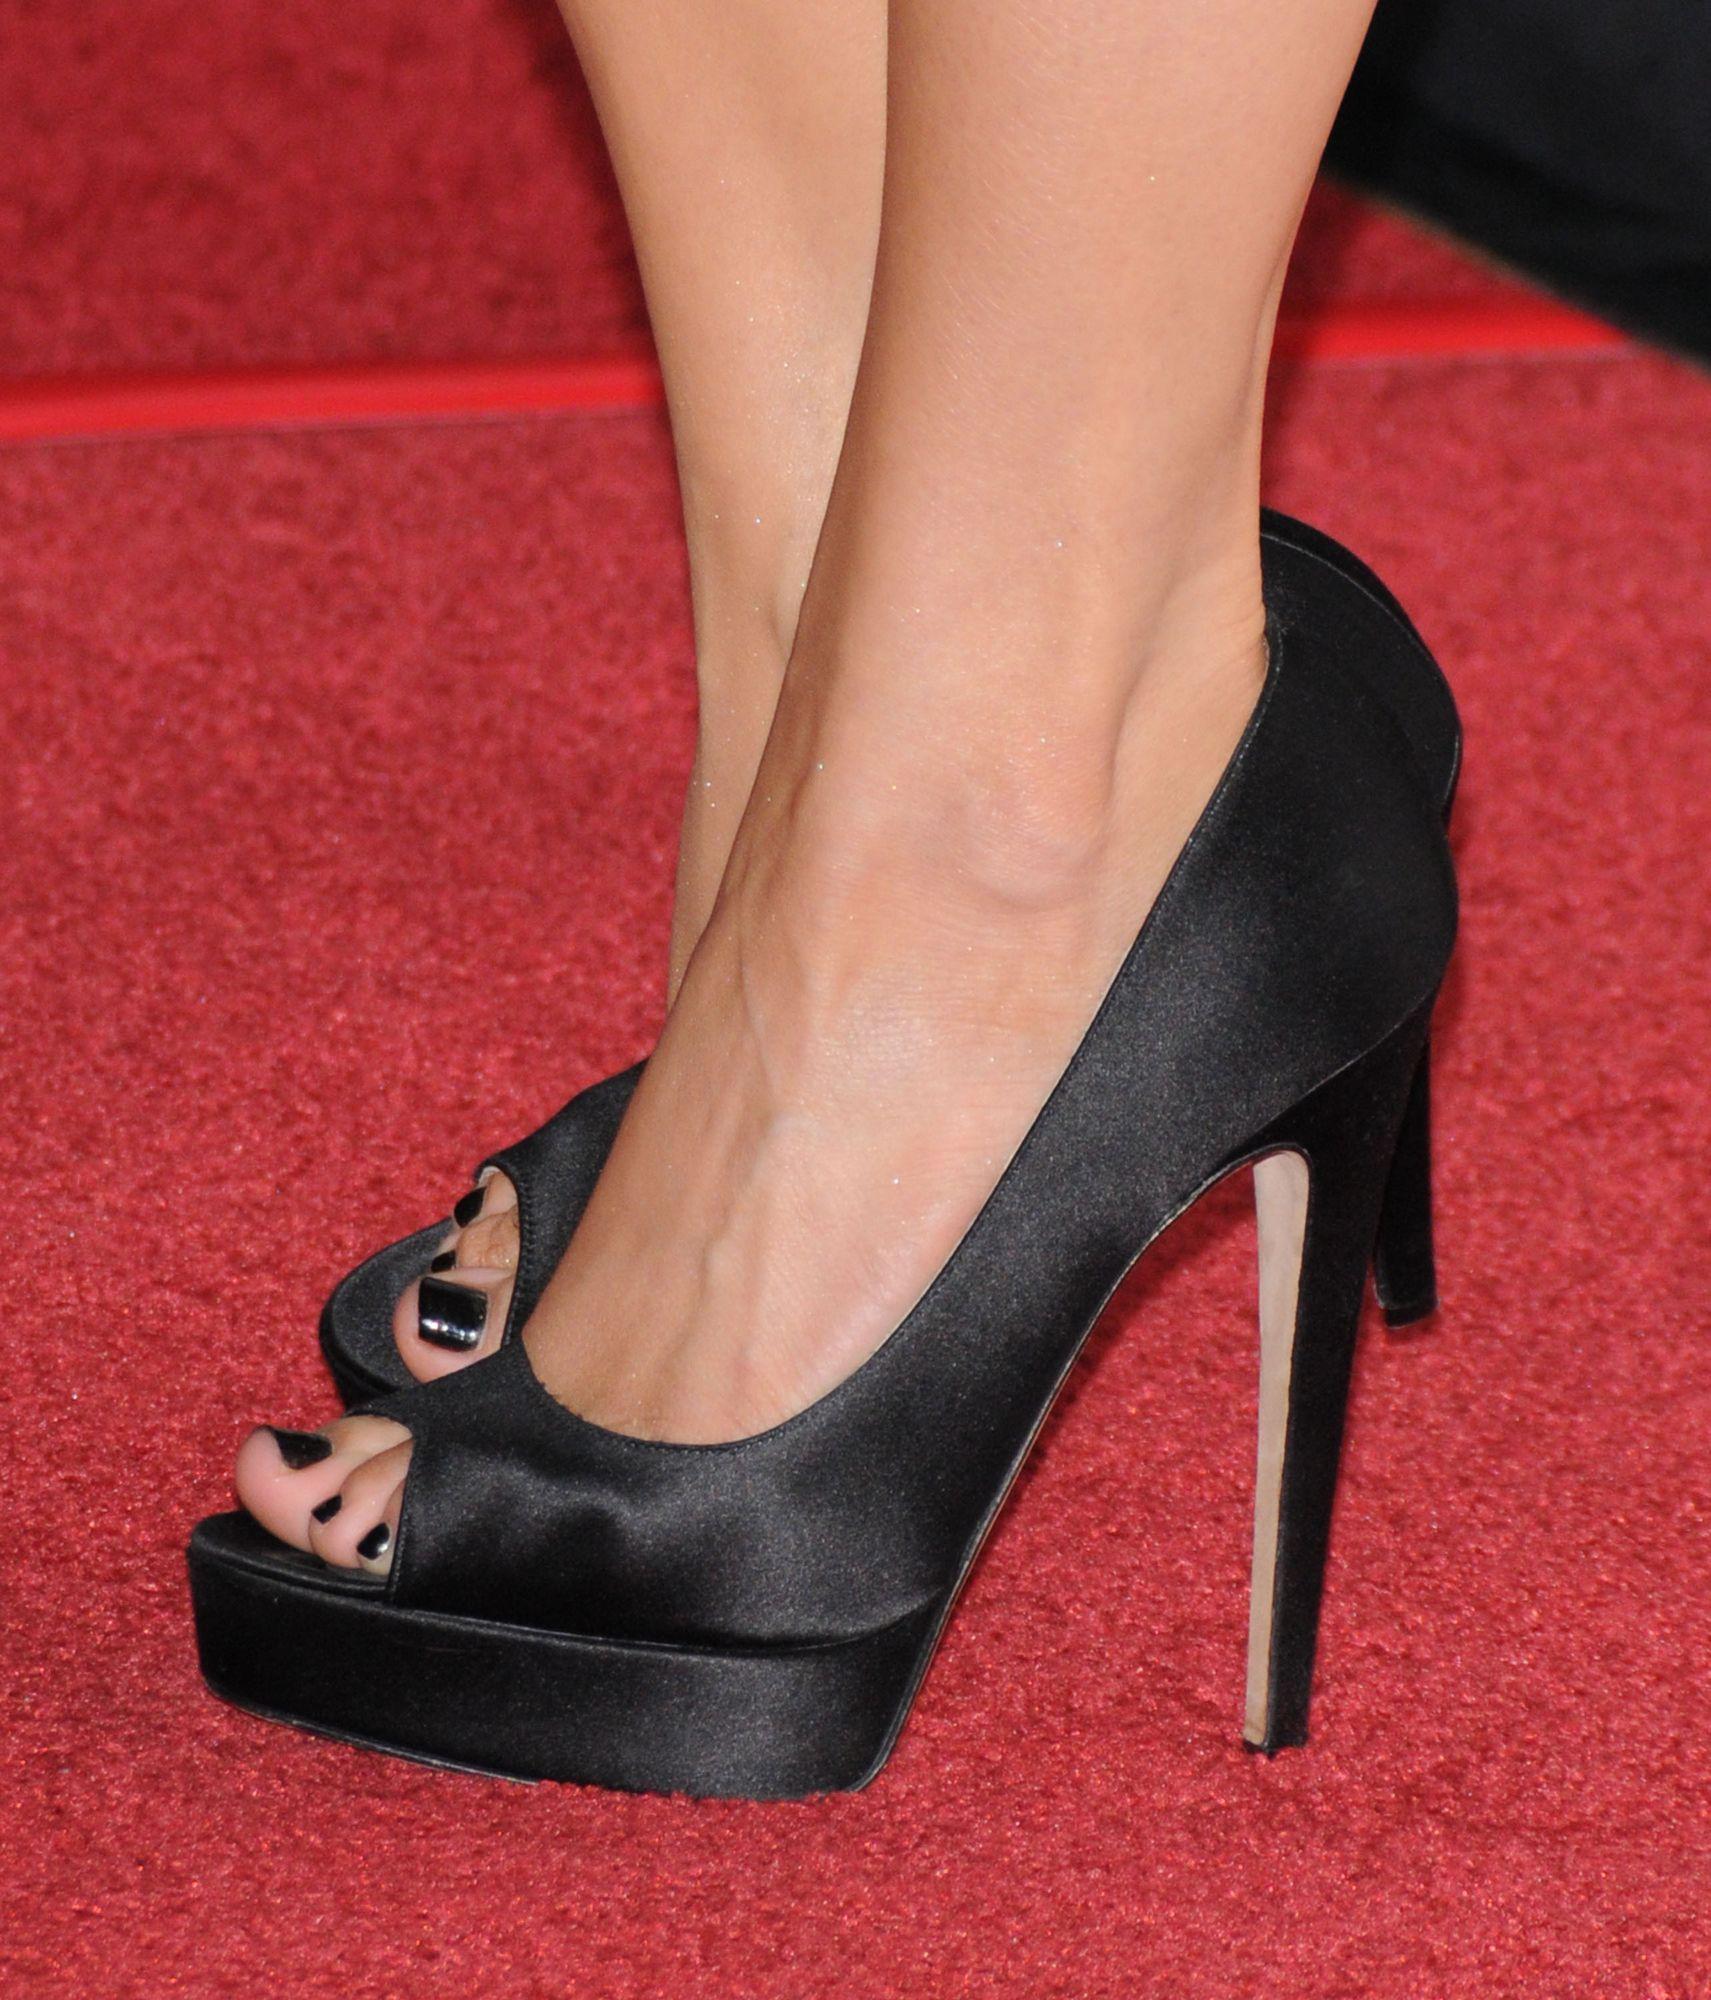 Ksenia Solos Feet-2570